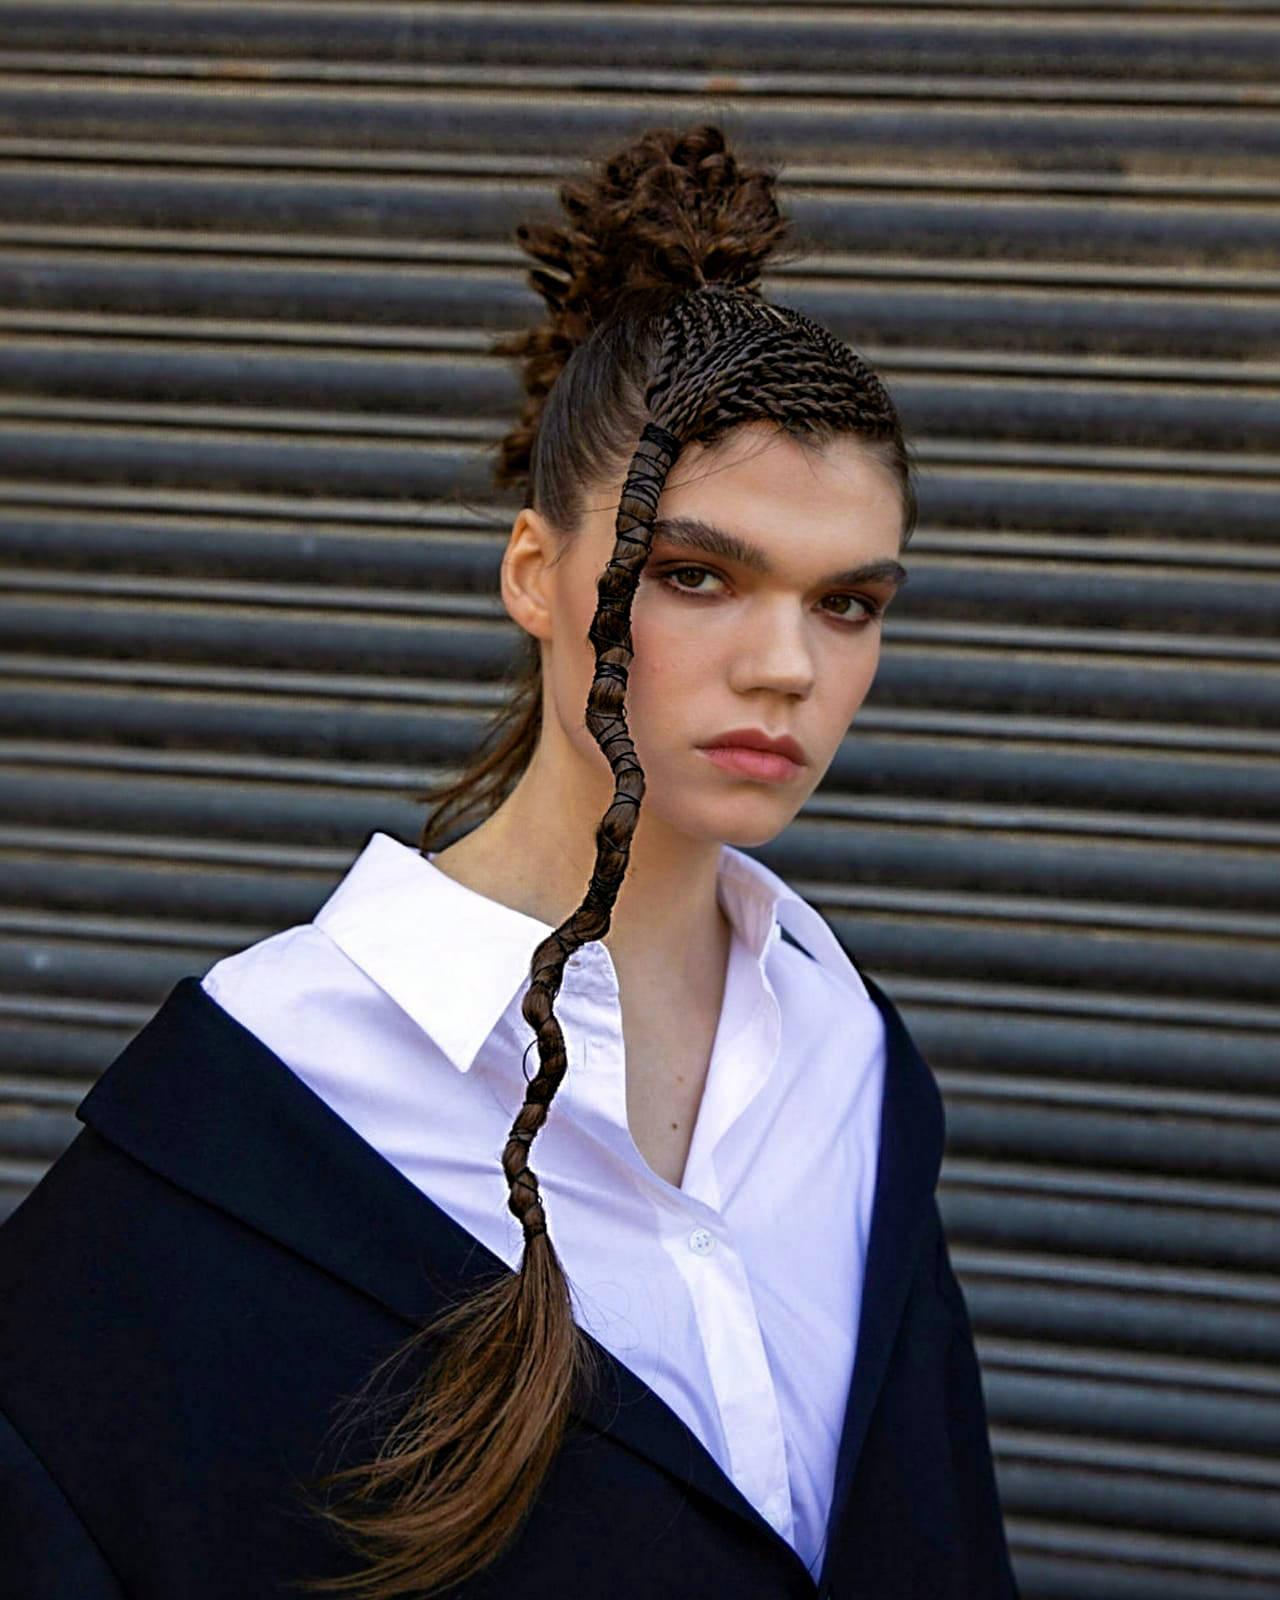 Rita Tuska at Joseph Ferraro Hair, Harrogate wins UK & Ireland Gold Editorial Look of the Year at the Wella Professionals TrendVision Award UK & Ireland Final 2020